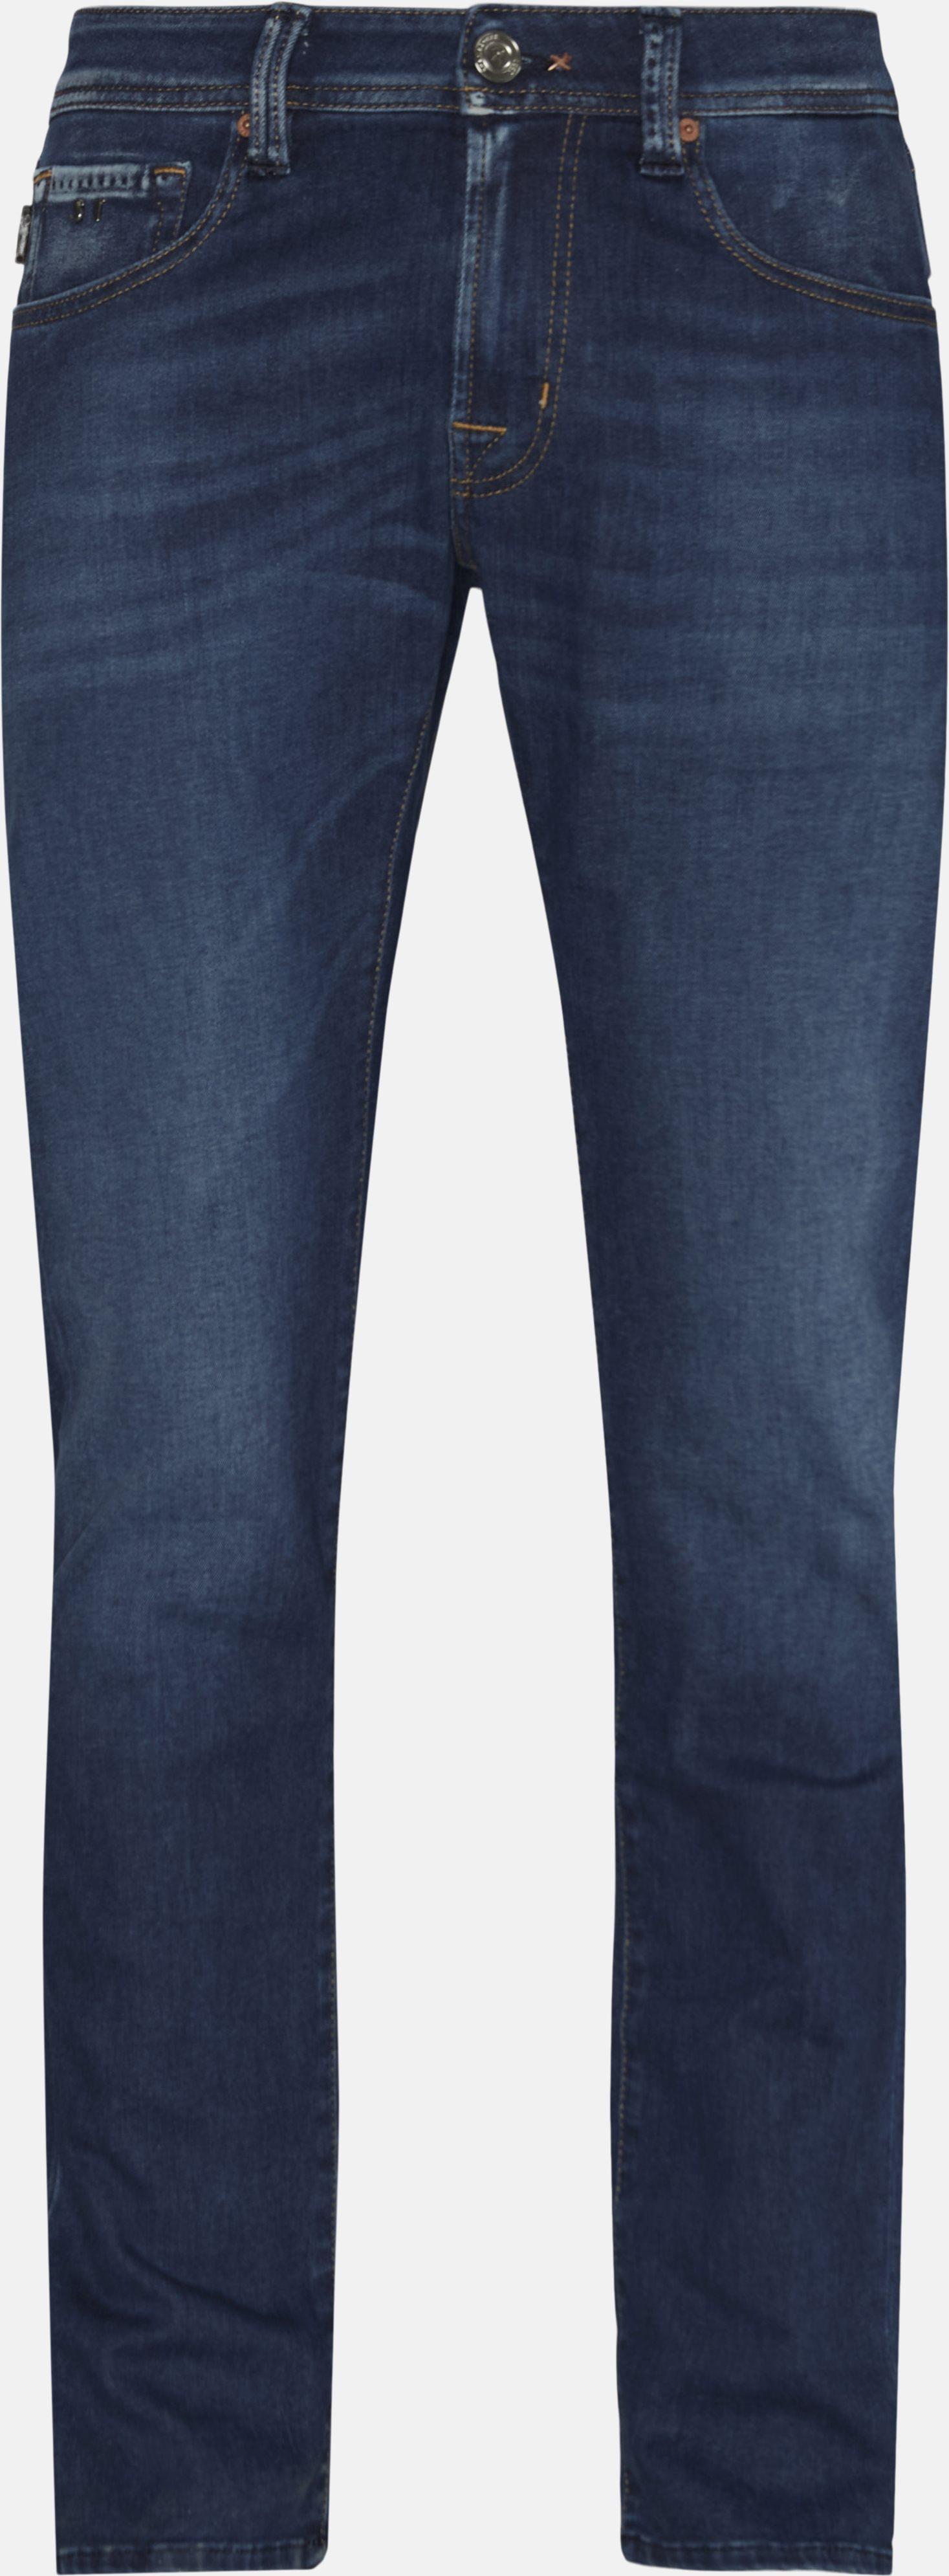 Jeans - Slim fit - Denim